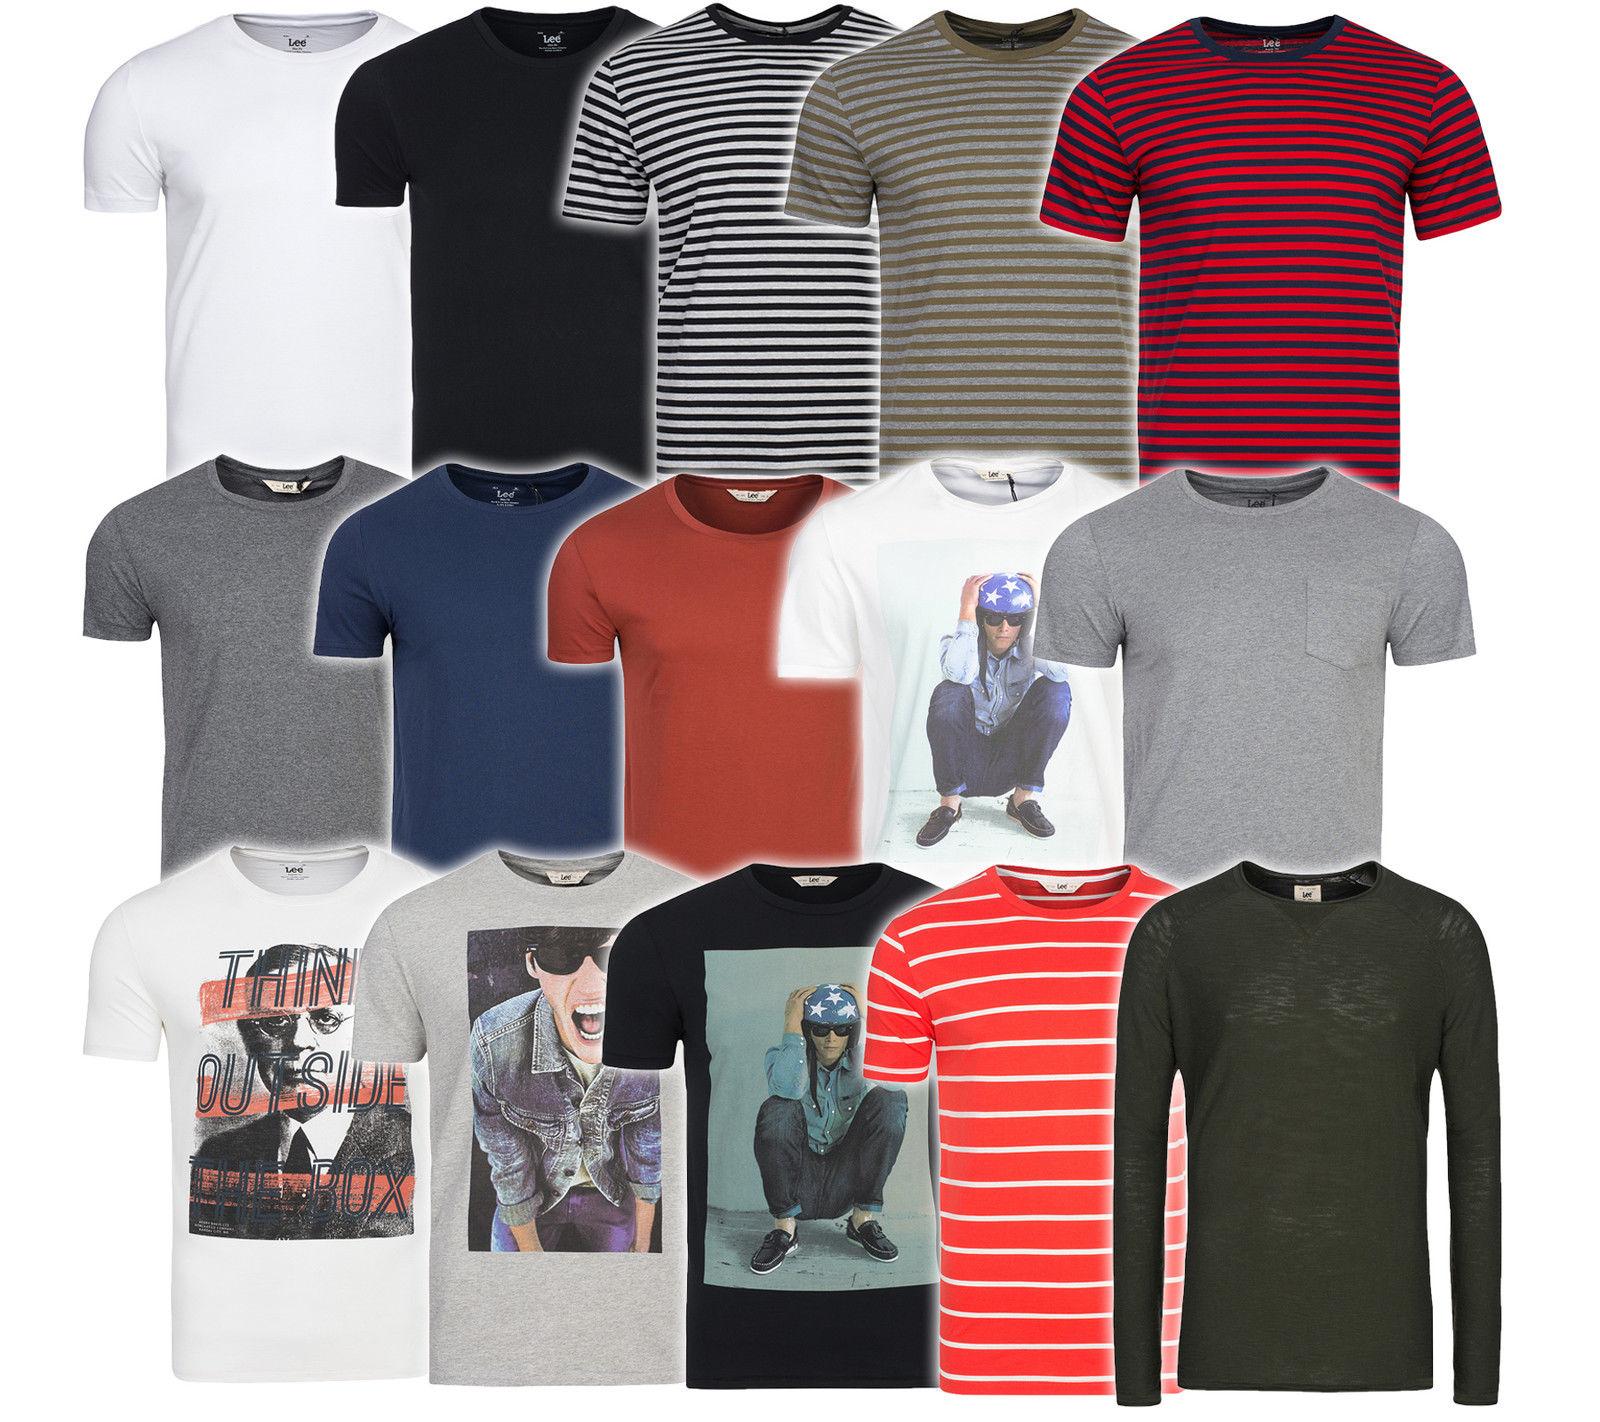 NEU Lee Herren T-Shirt Freizeit-Shirt Sweater Stripe, Plain Pocket, Crew Knit @Ebay - Outlet46